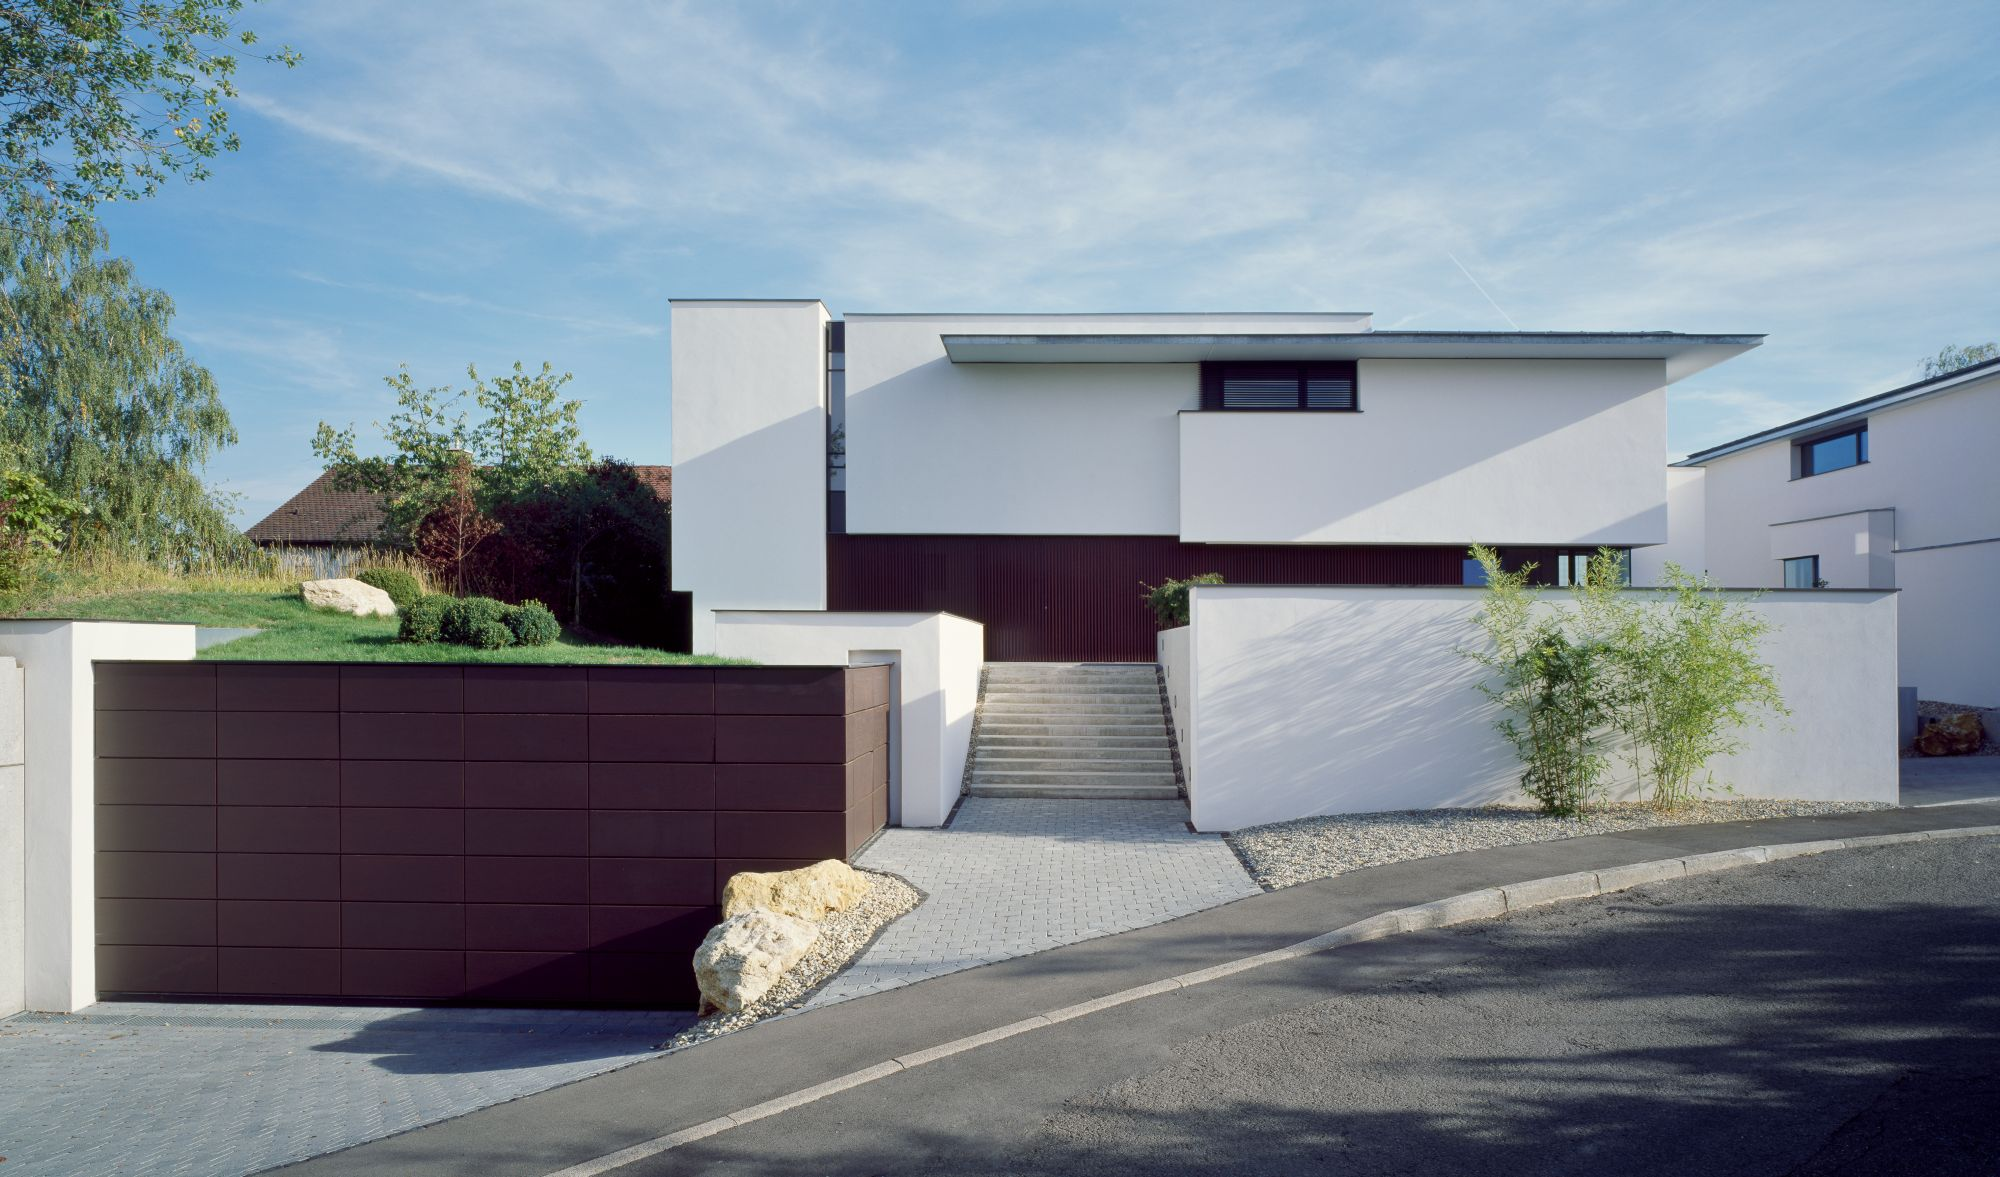 House Miki 1  Alexander Brenner Architects  Archello